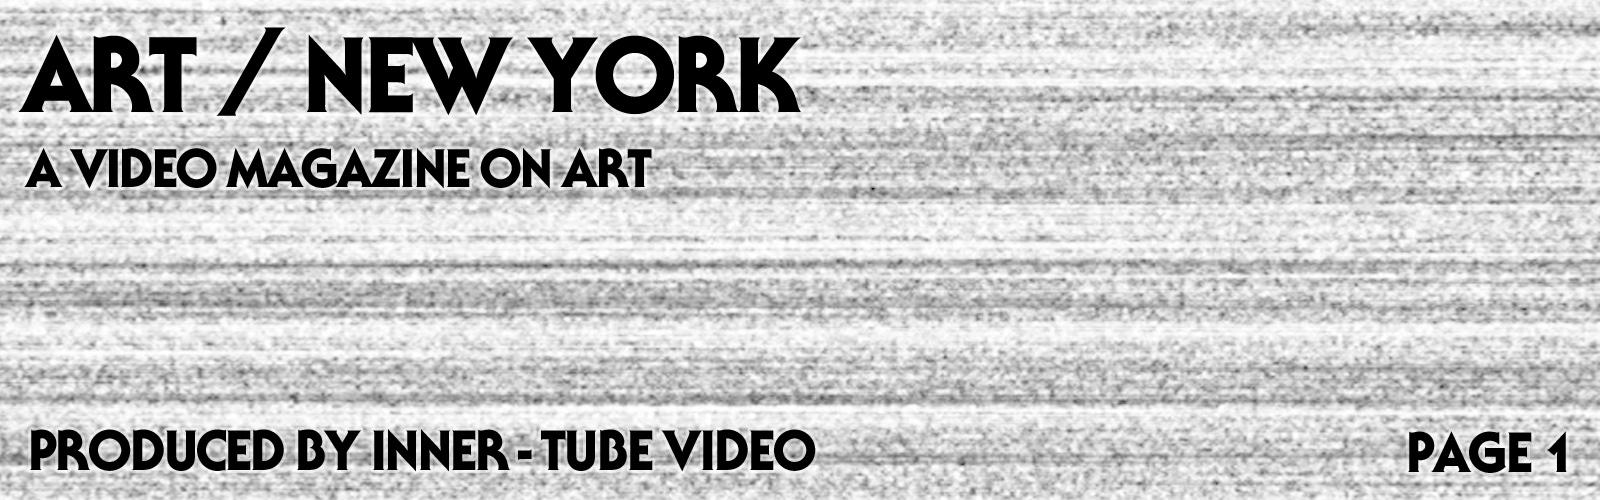 art-newyork-cover-page1.jpg